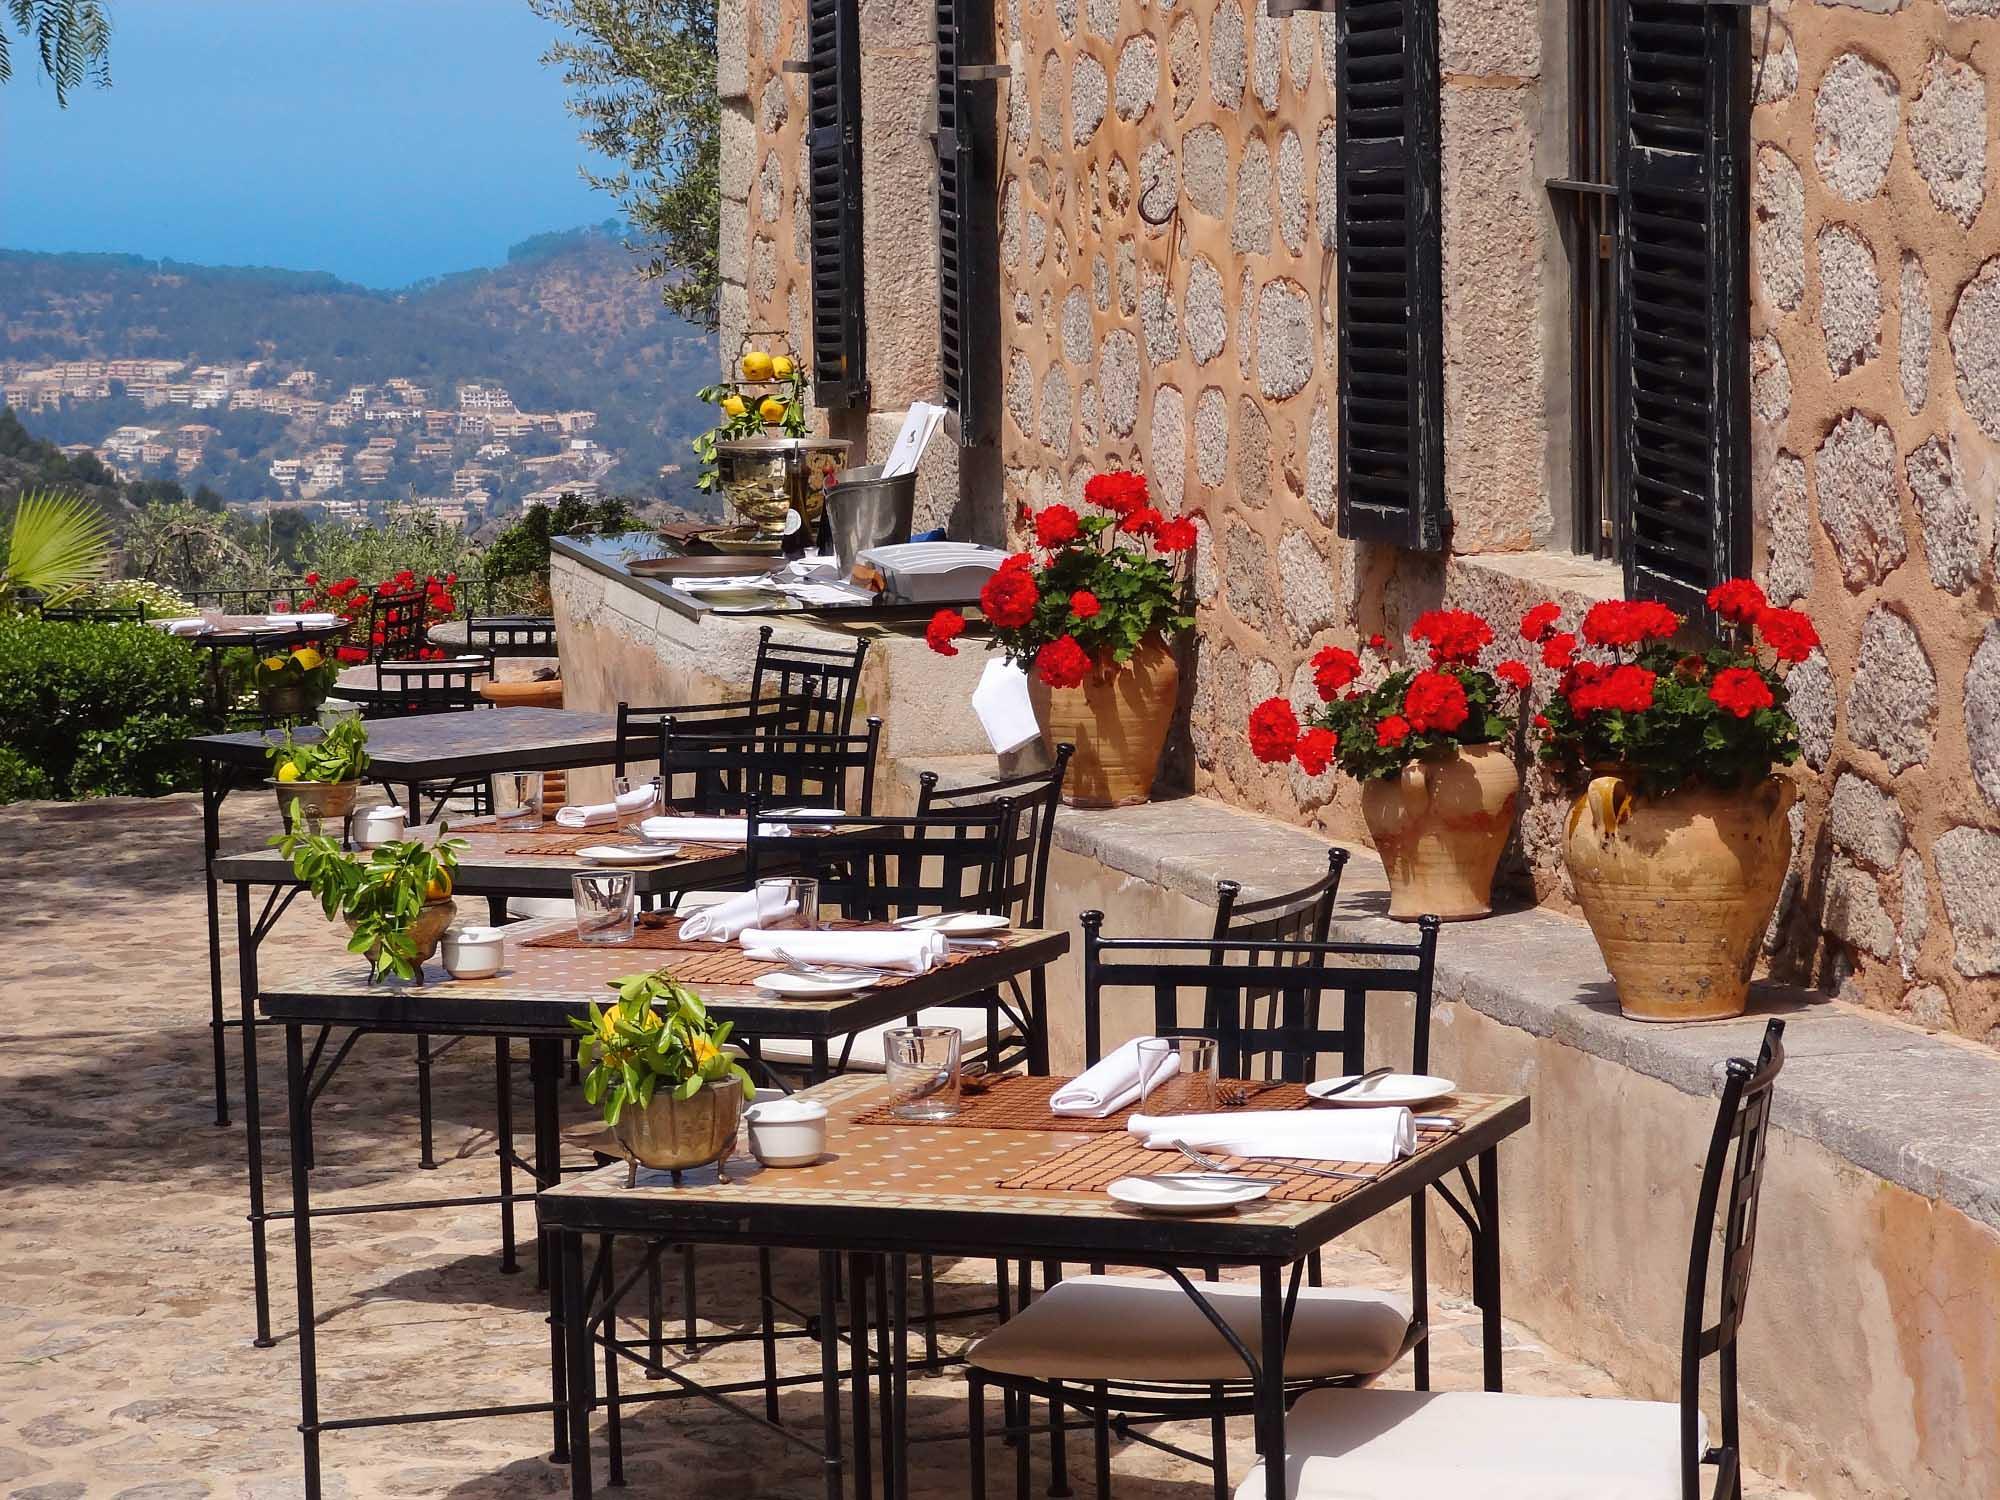 Restaurant mit Ausblick. Foto: Xacorc